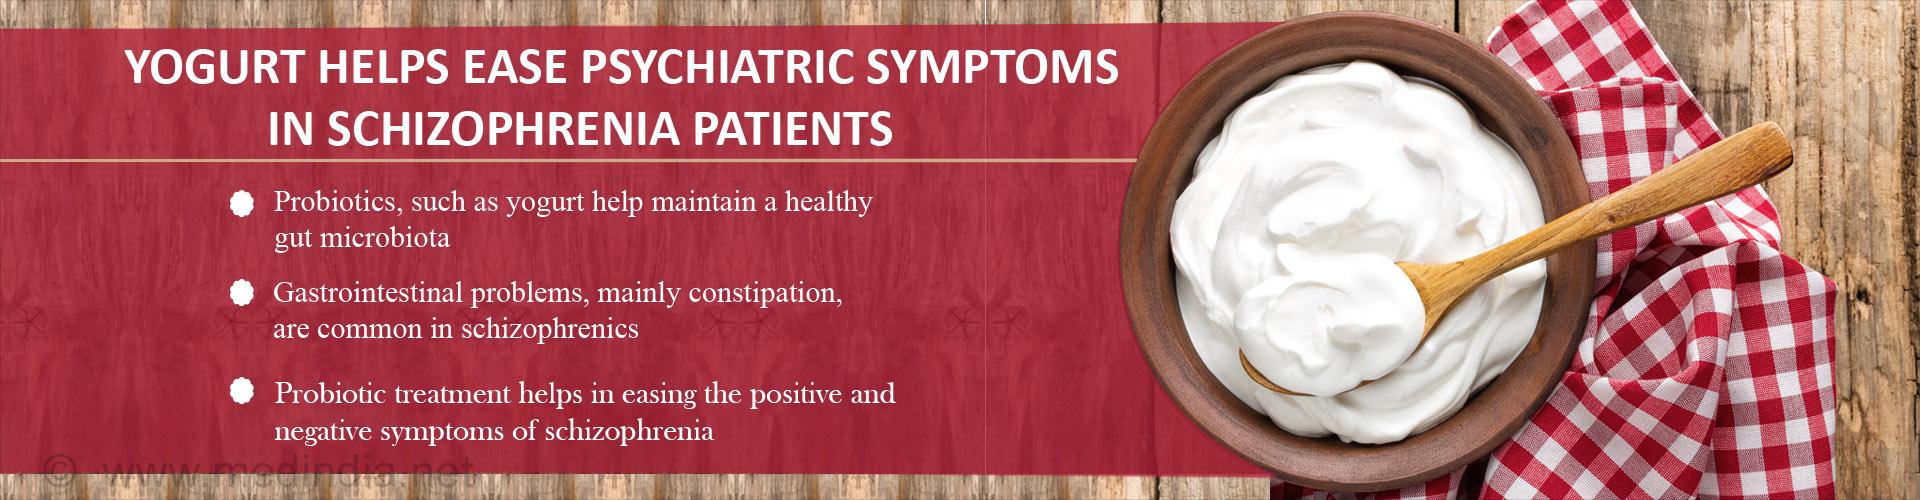 Yogurt Helps Ease Psychiatric Symptoms in Schizophrenia Patients